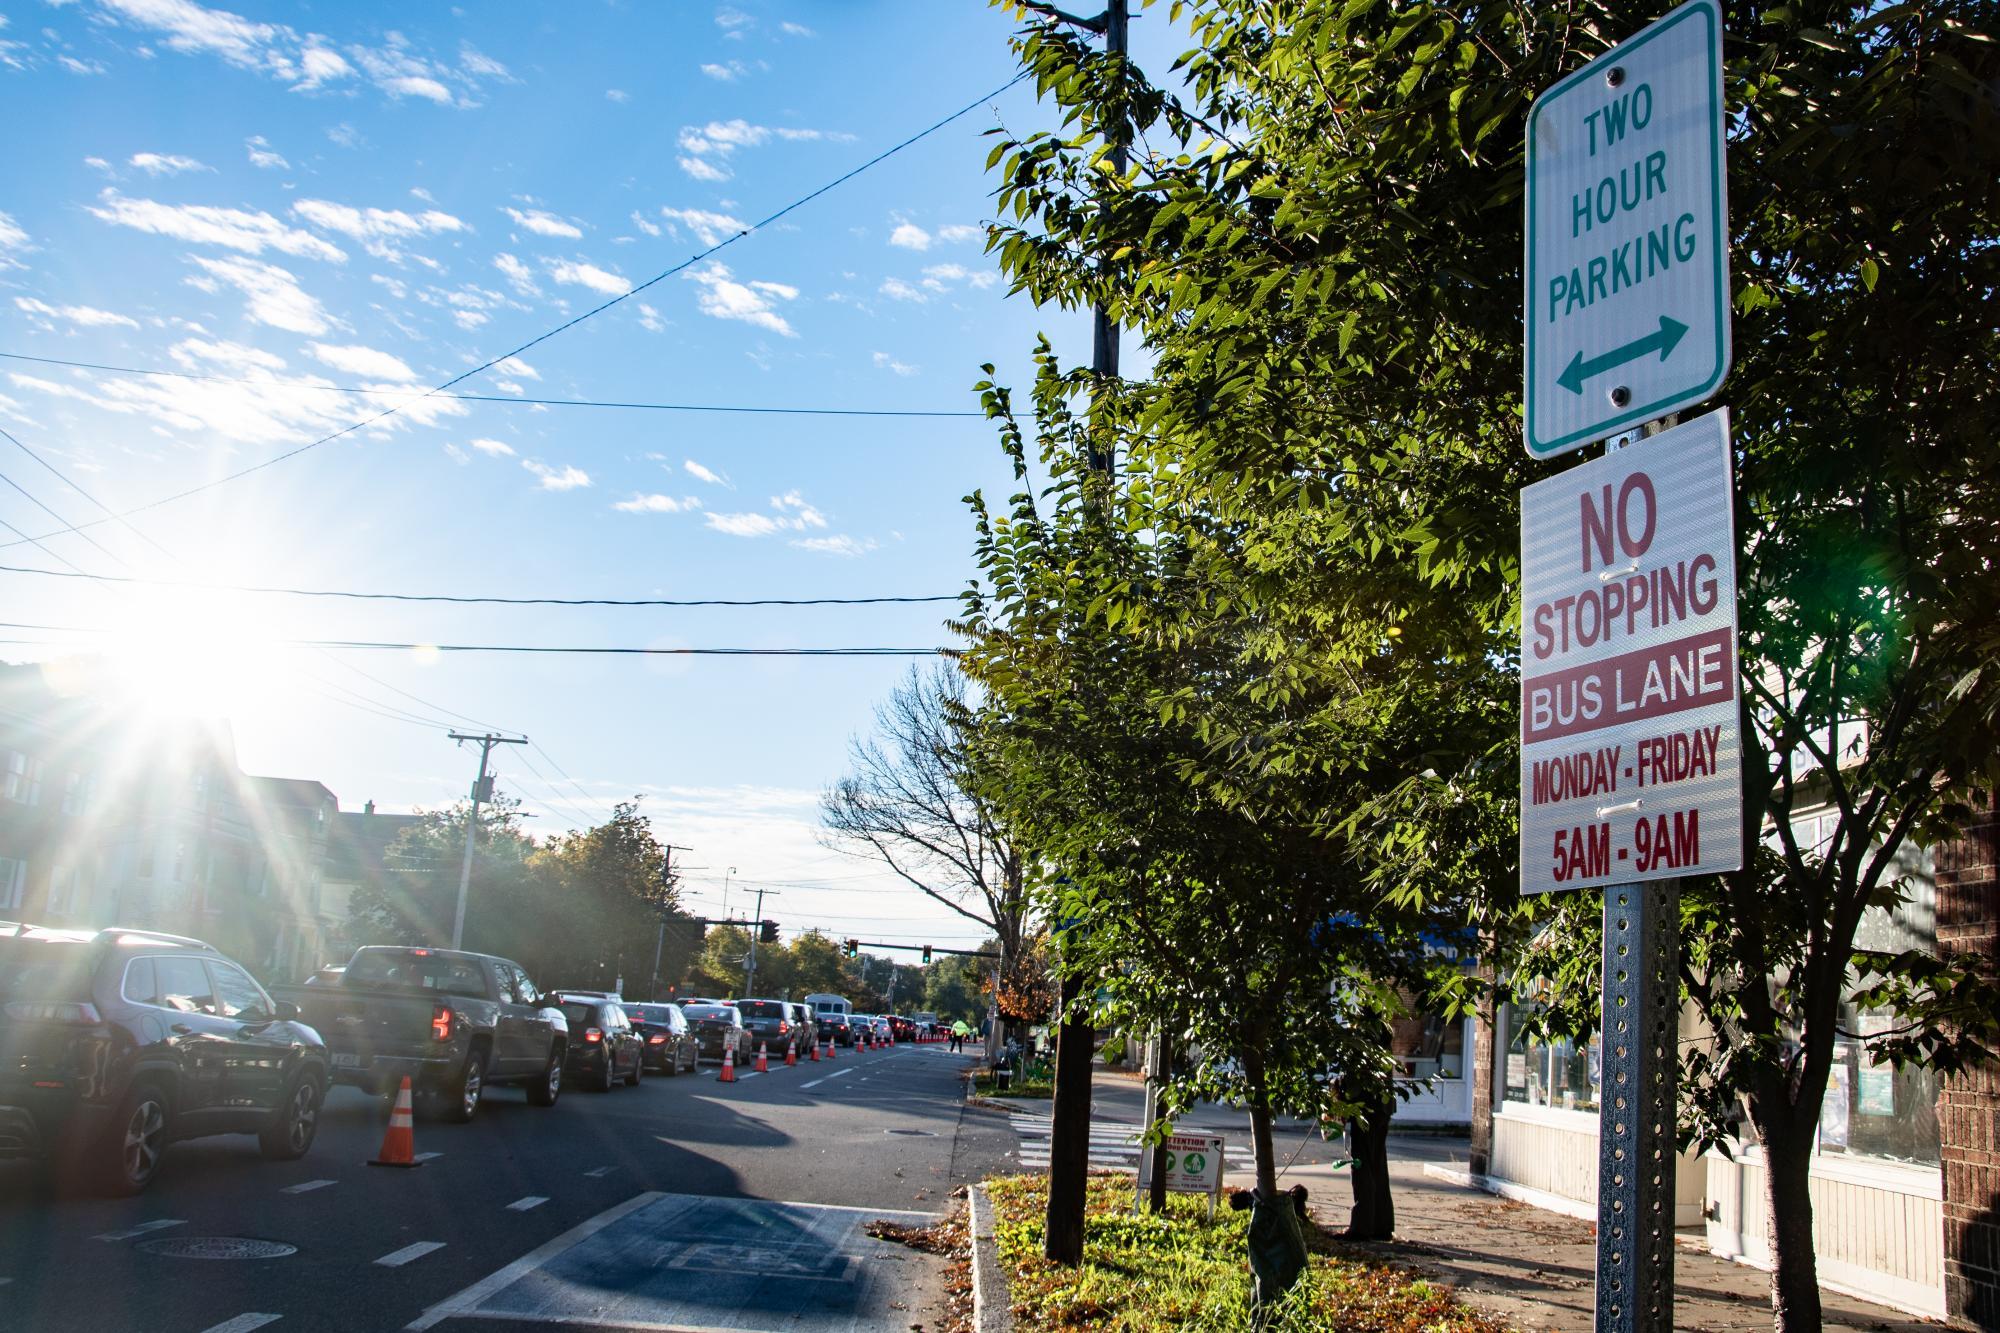 """No Stopping | Bus Lane | Monday - Friday | 5 AM - 9 AM"" sign during the Arlington pilot."